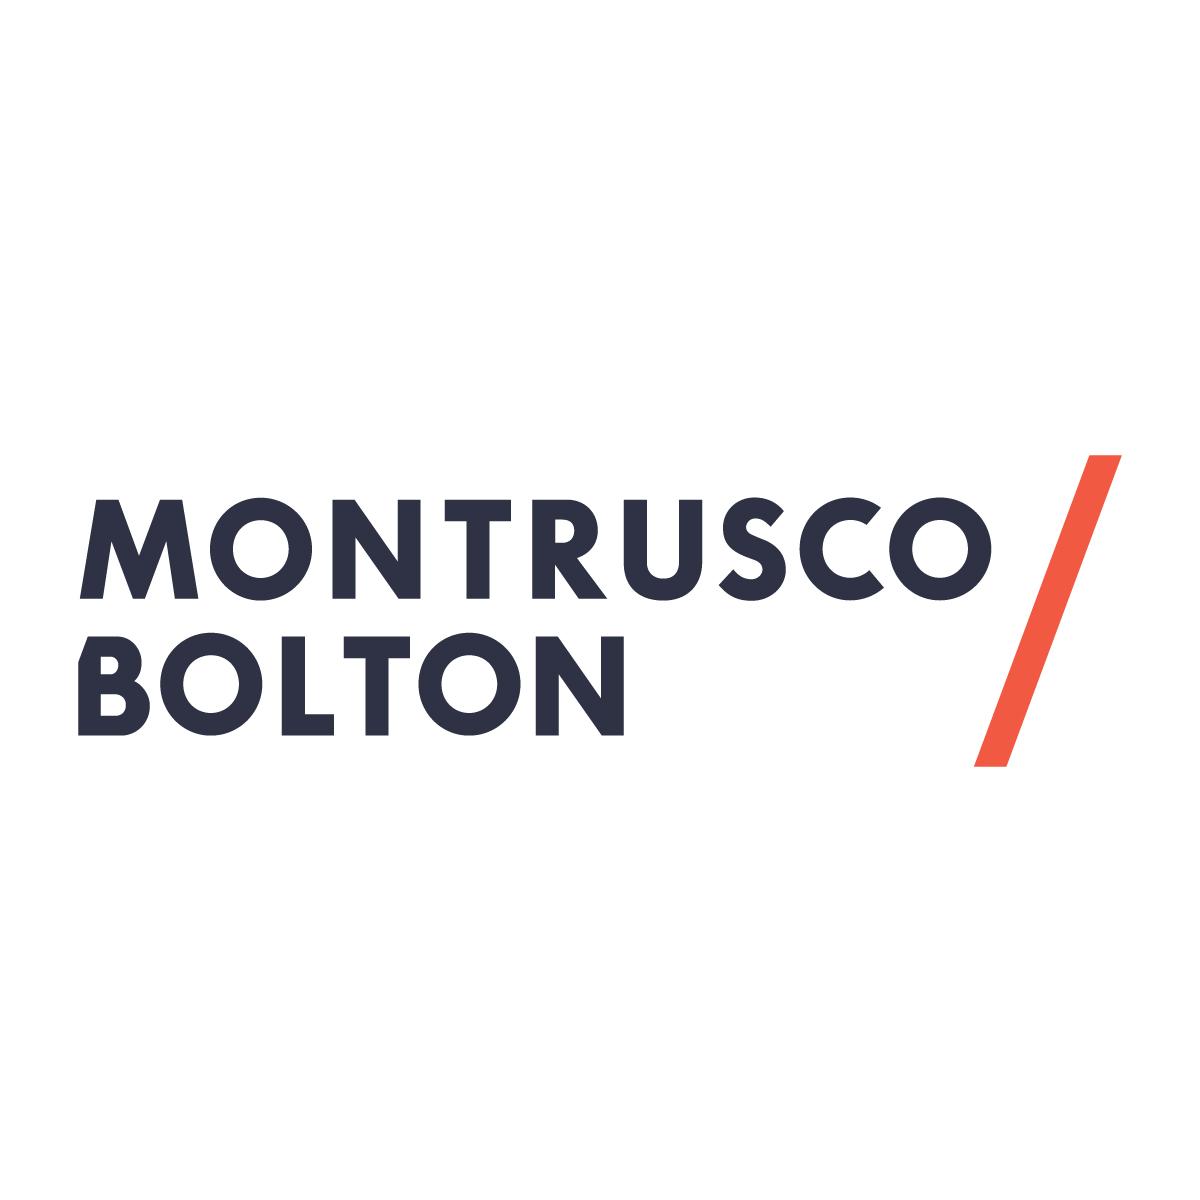 Montrusco_bolton_logotype_signature_RGB_4x4